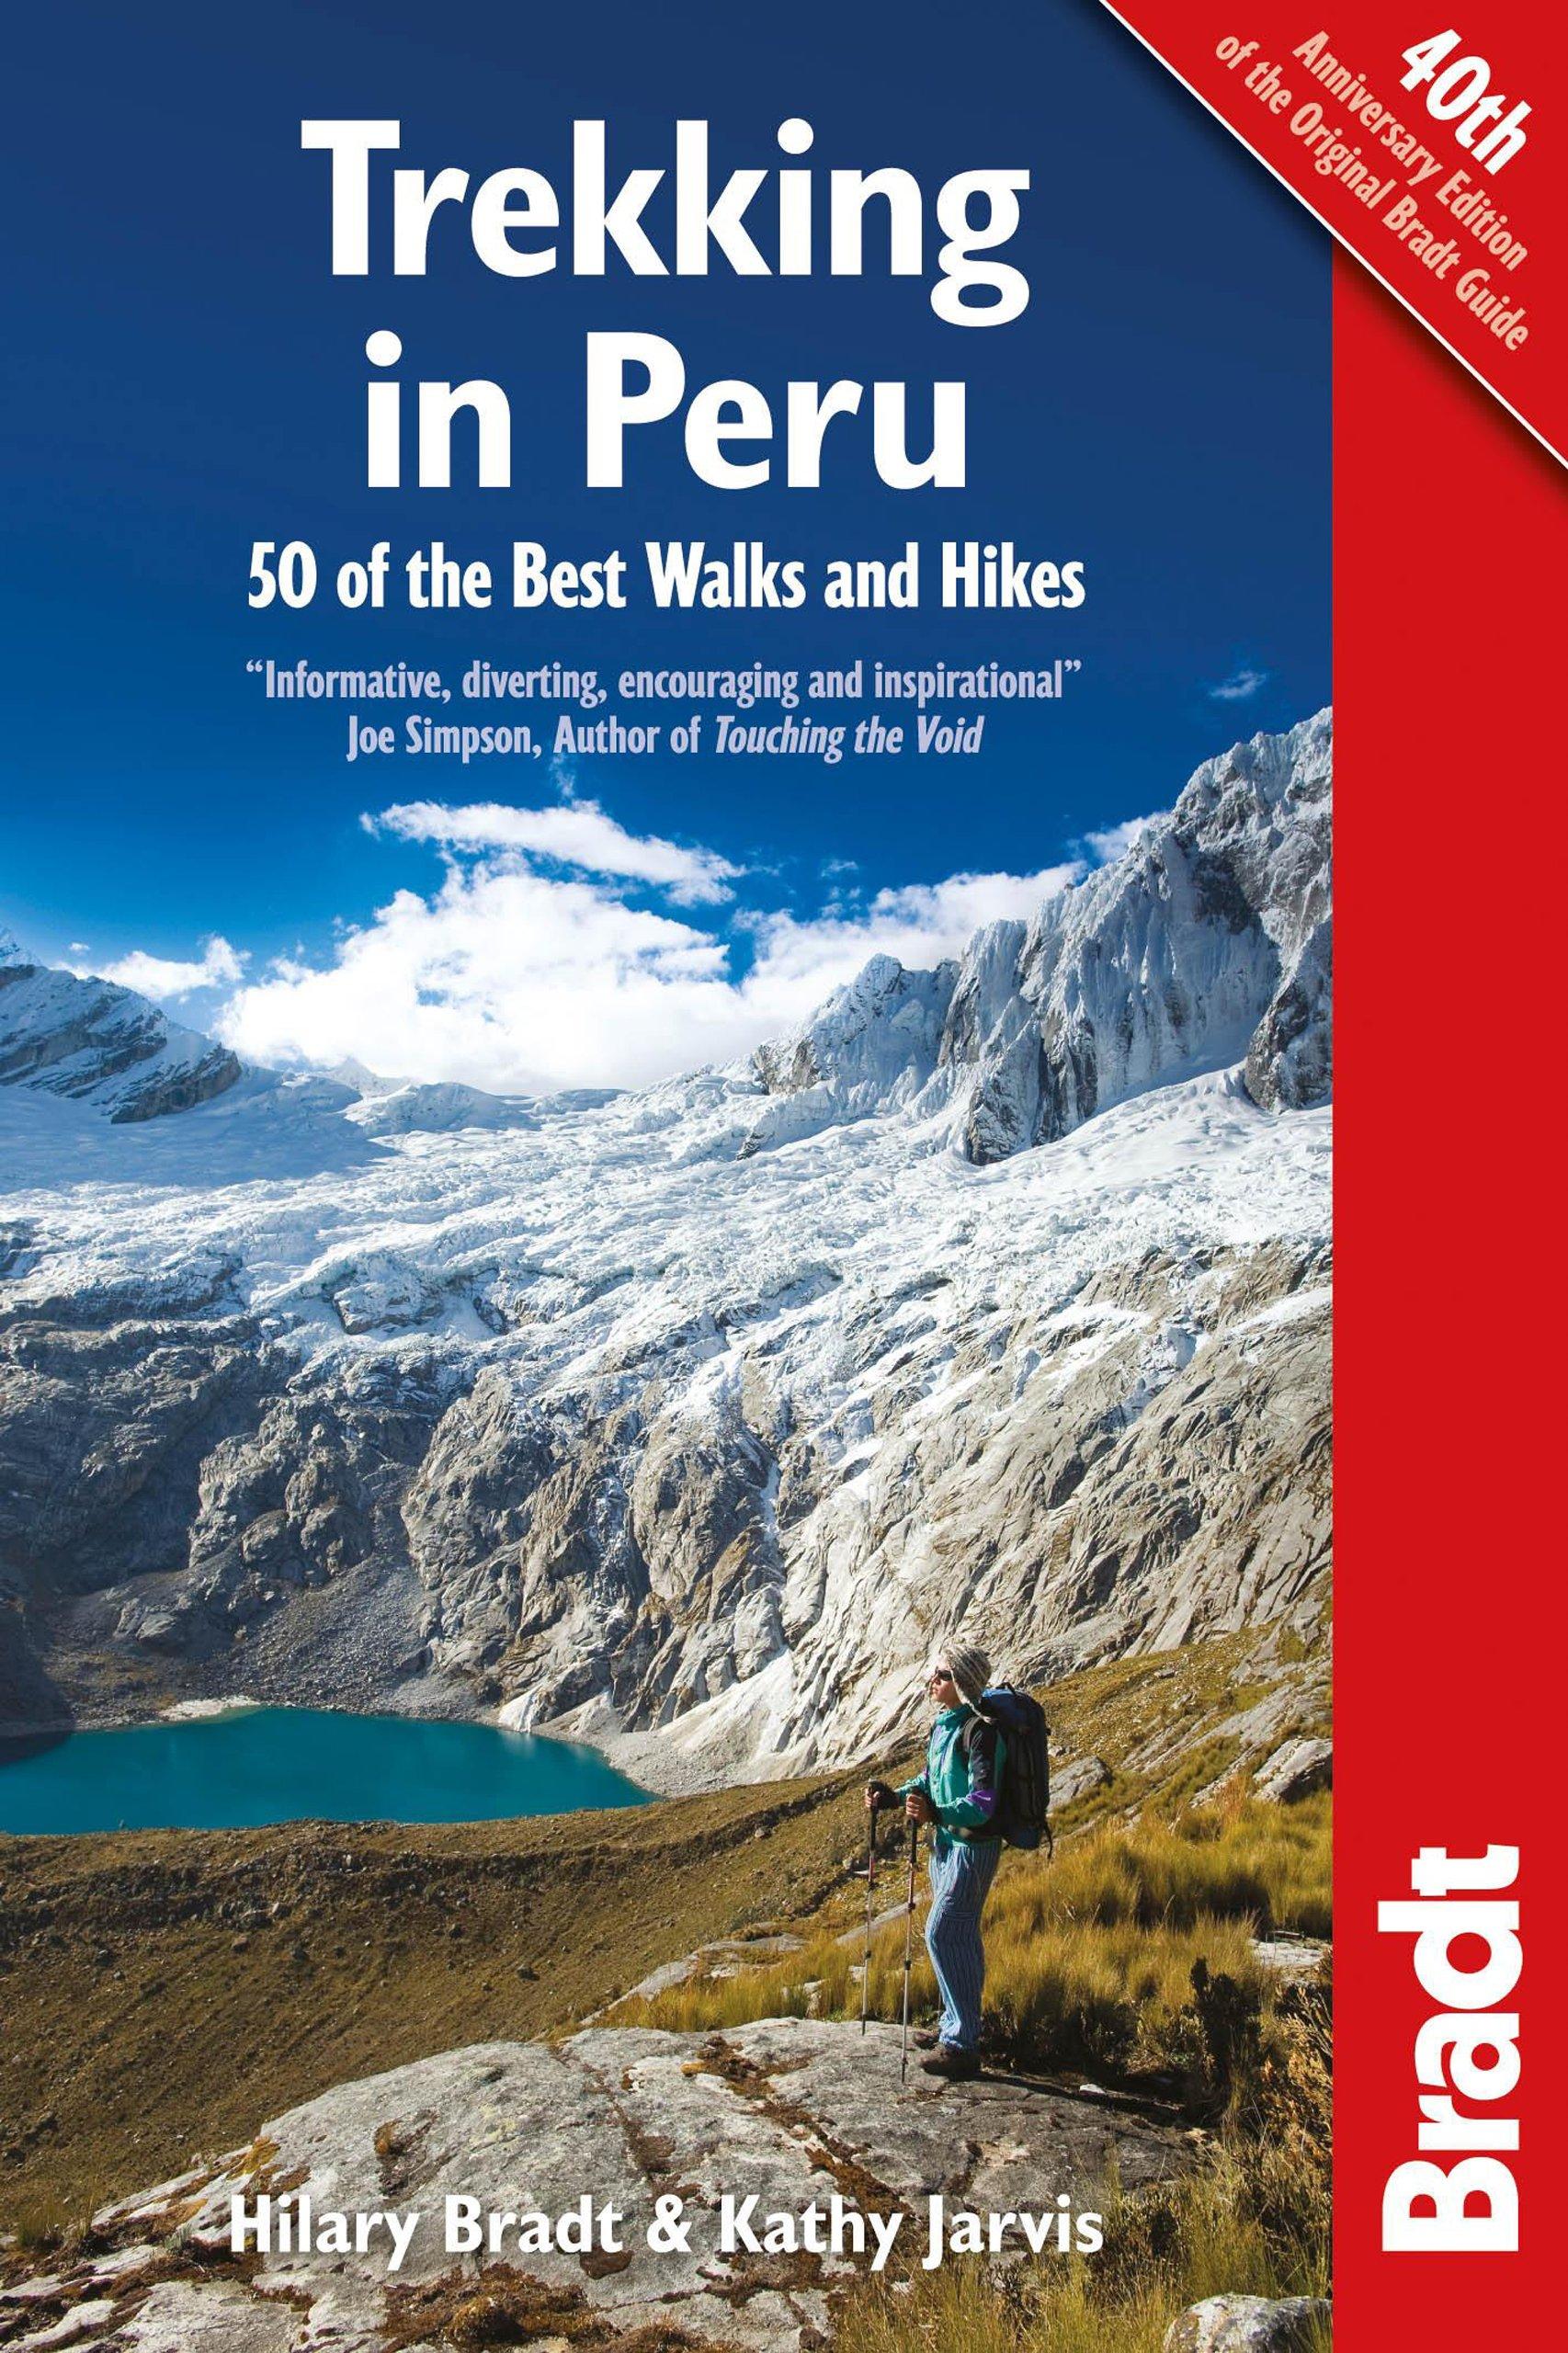 trekking in peru guidebook